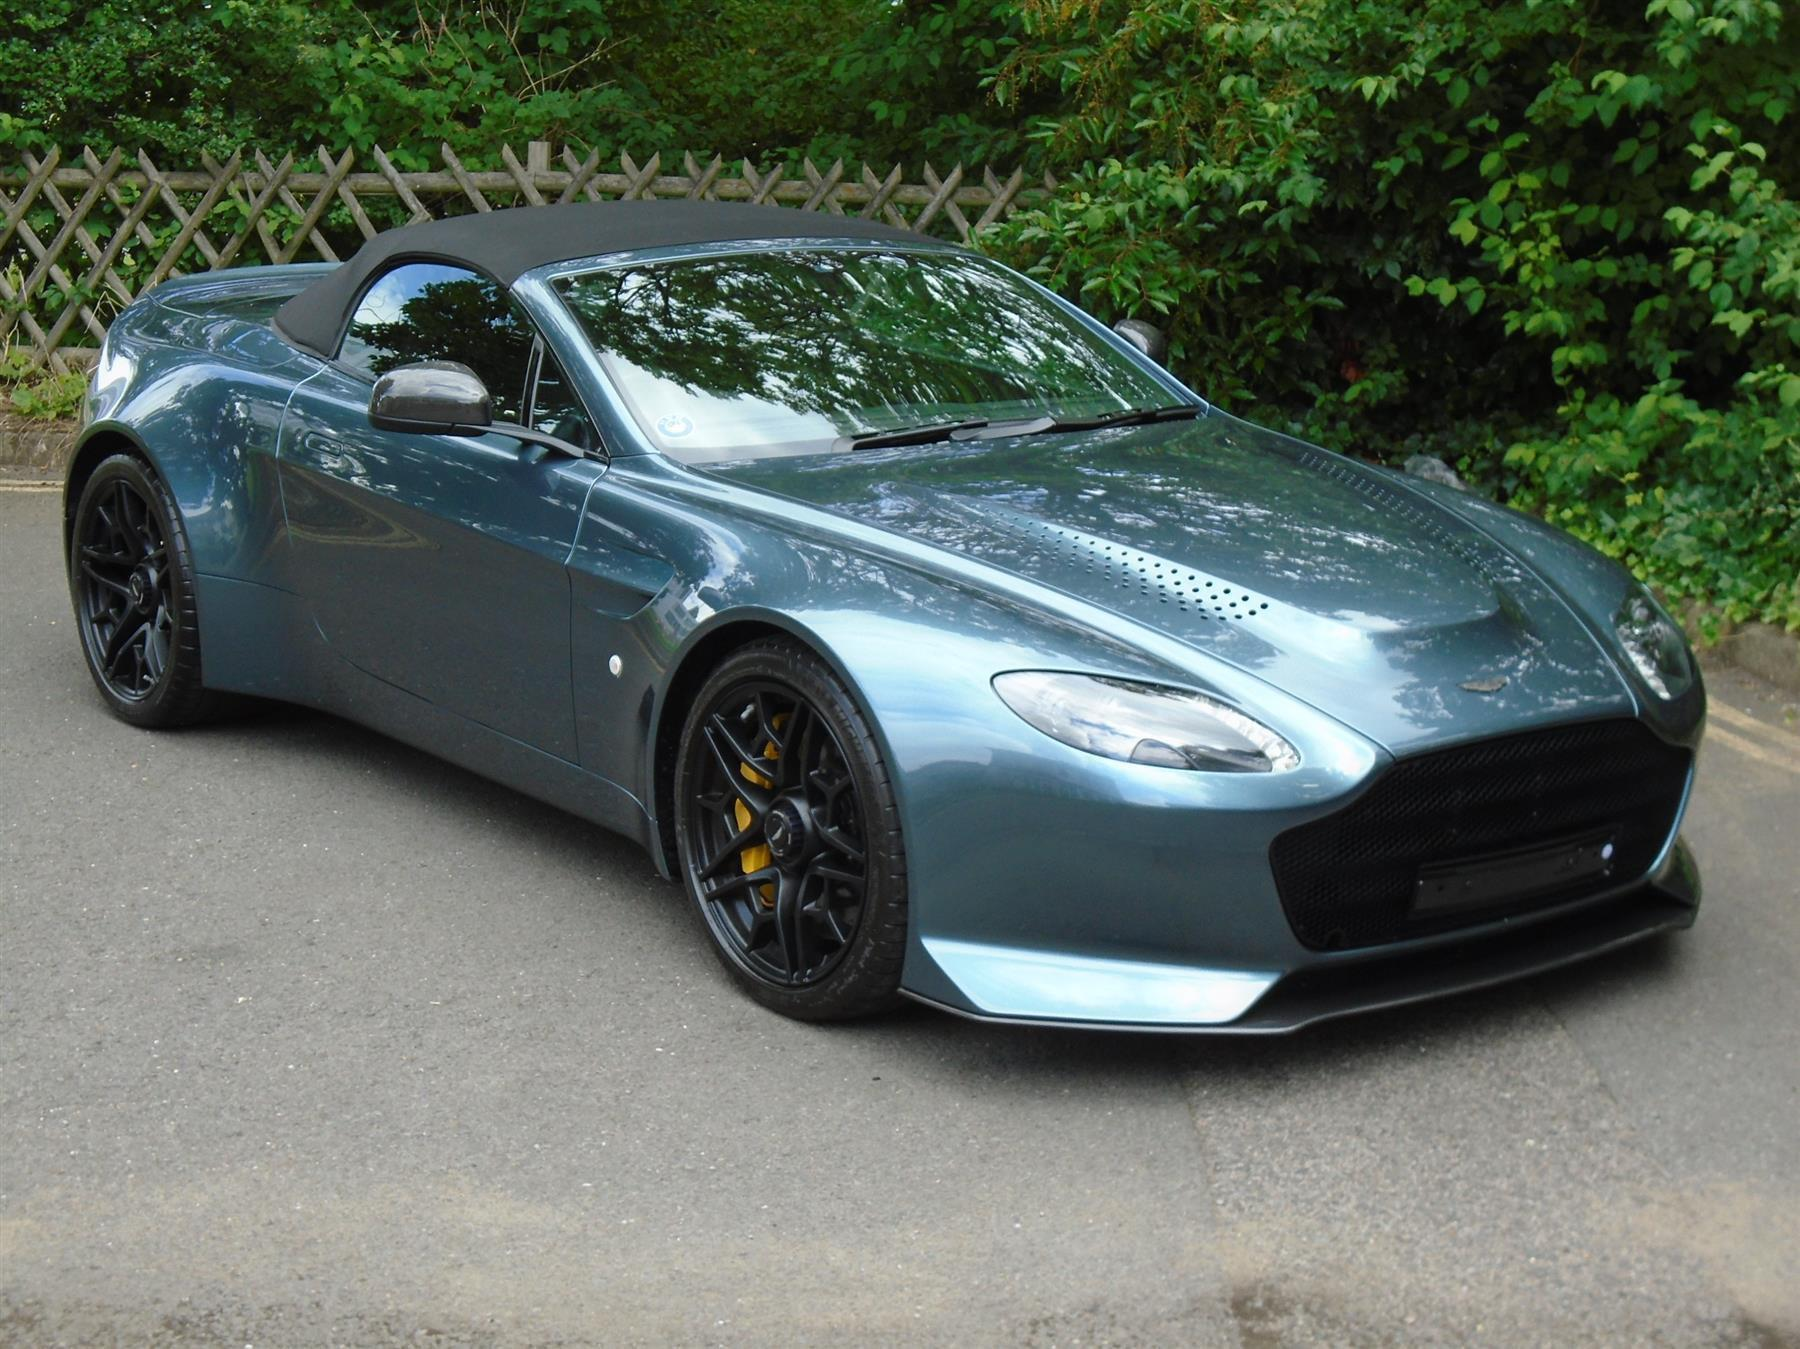 Aston_Martin_V12_Vantage_V600_Roadster_sale-0000